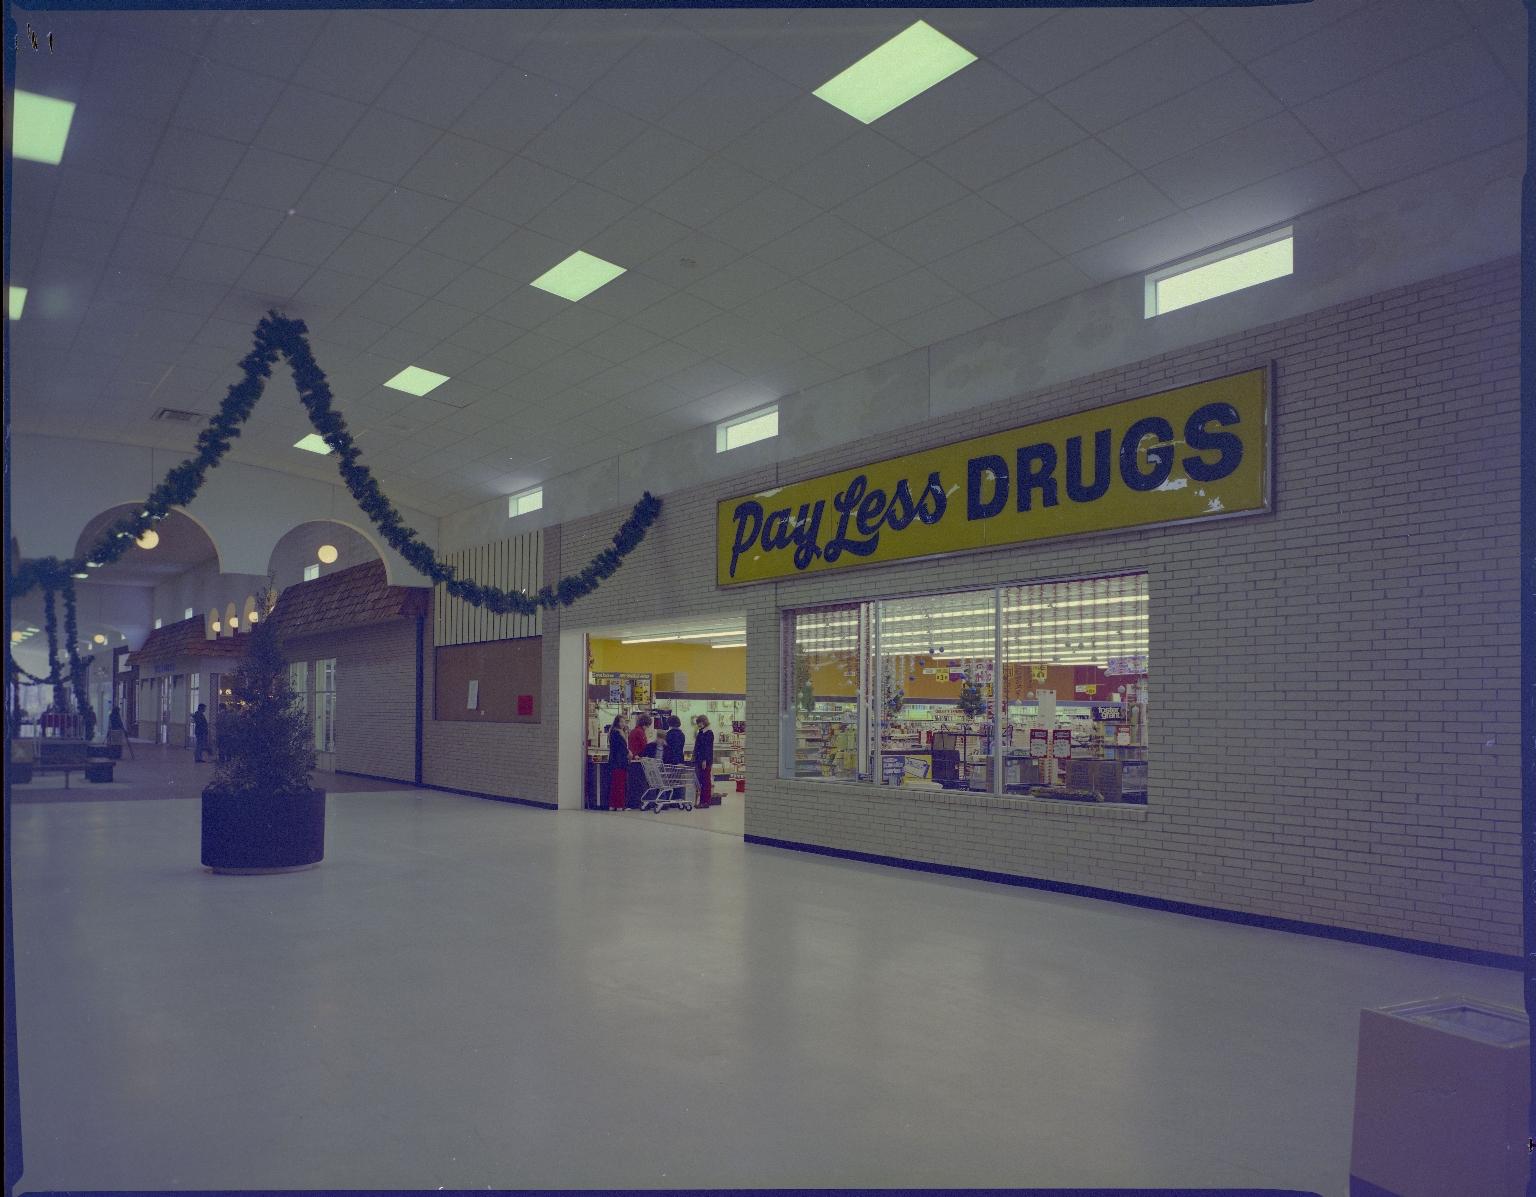 Paducah Mall/Payless Drugs